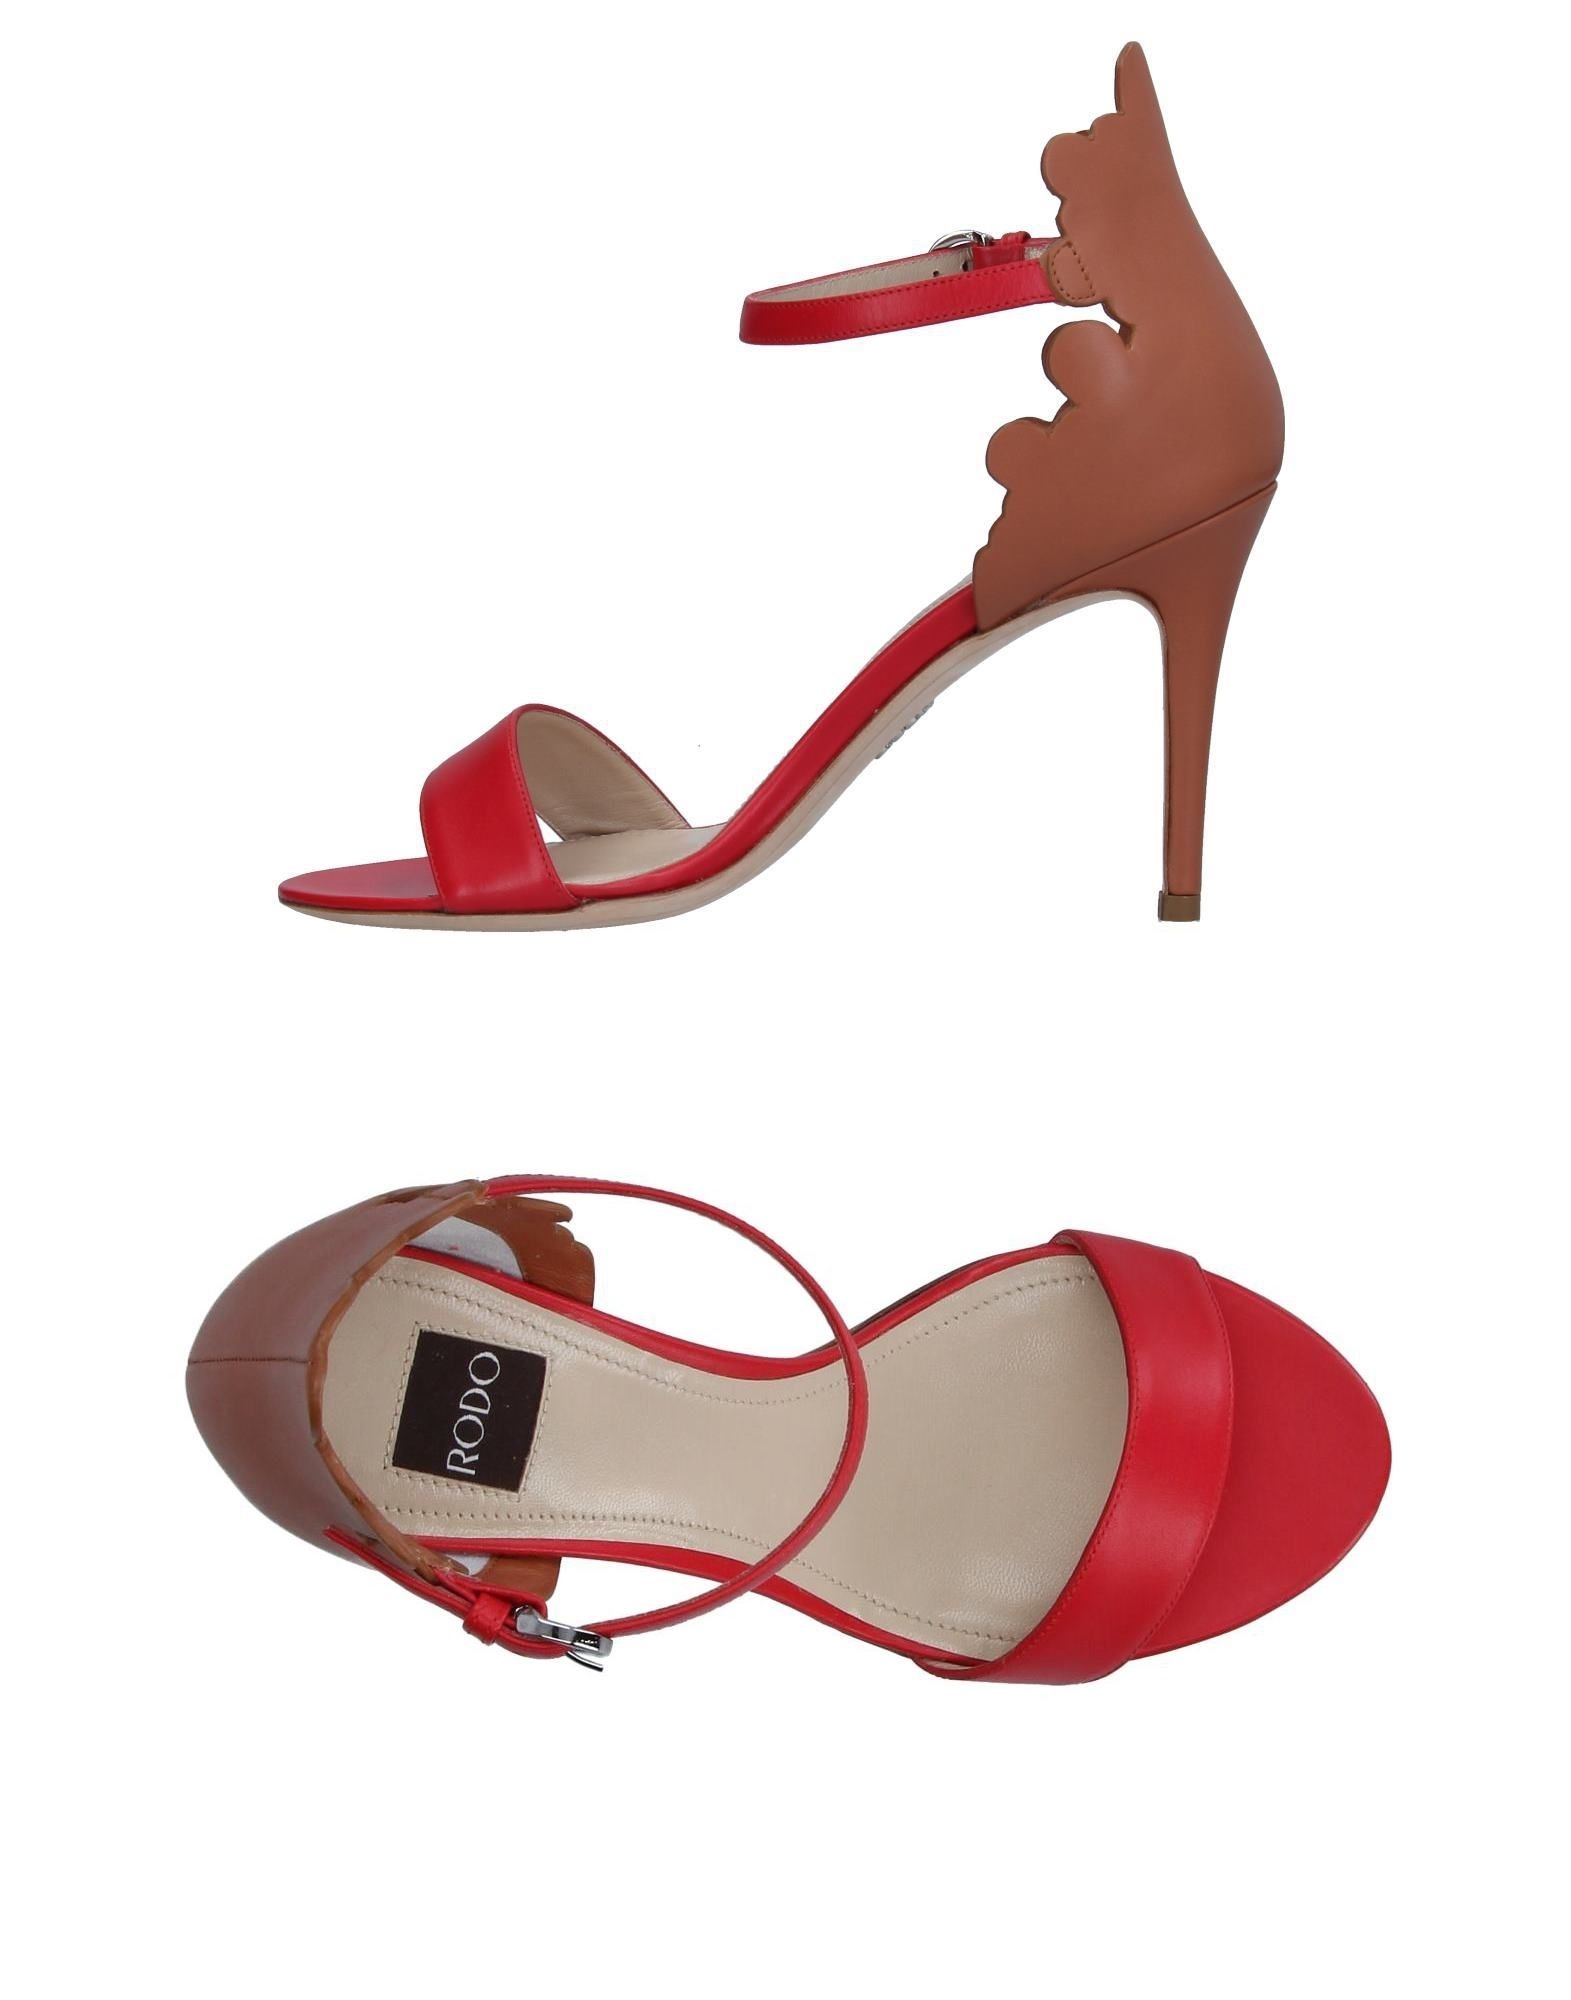 Stilvolle billige Schuhe Damen Rodo Sandalen Damen Schuhe  11351762DH f72ad9